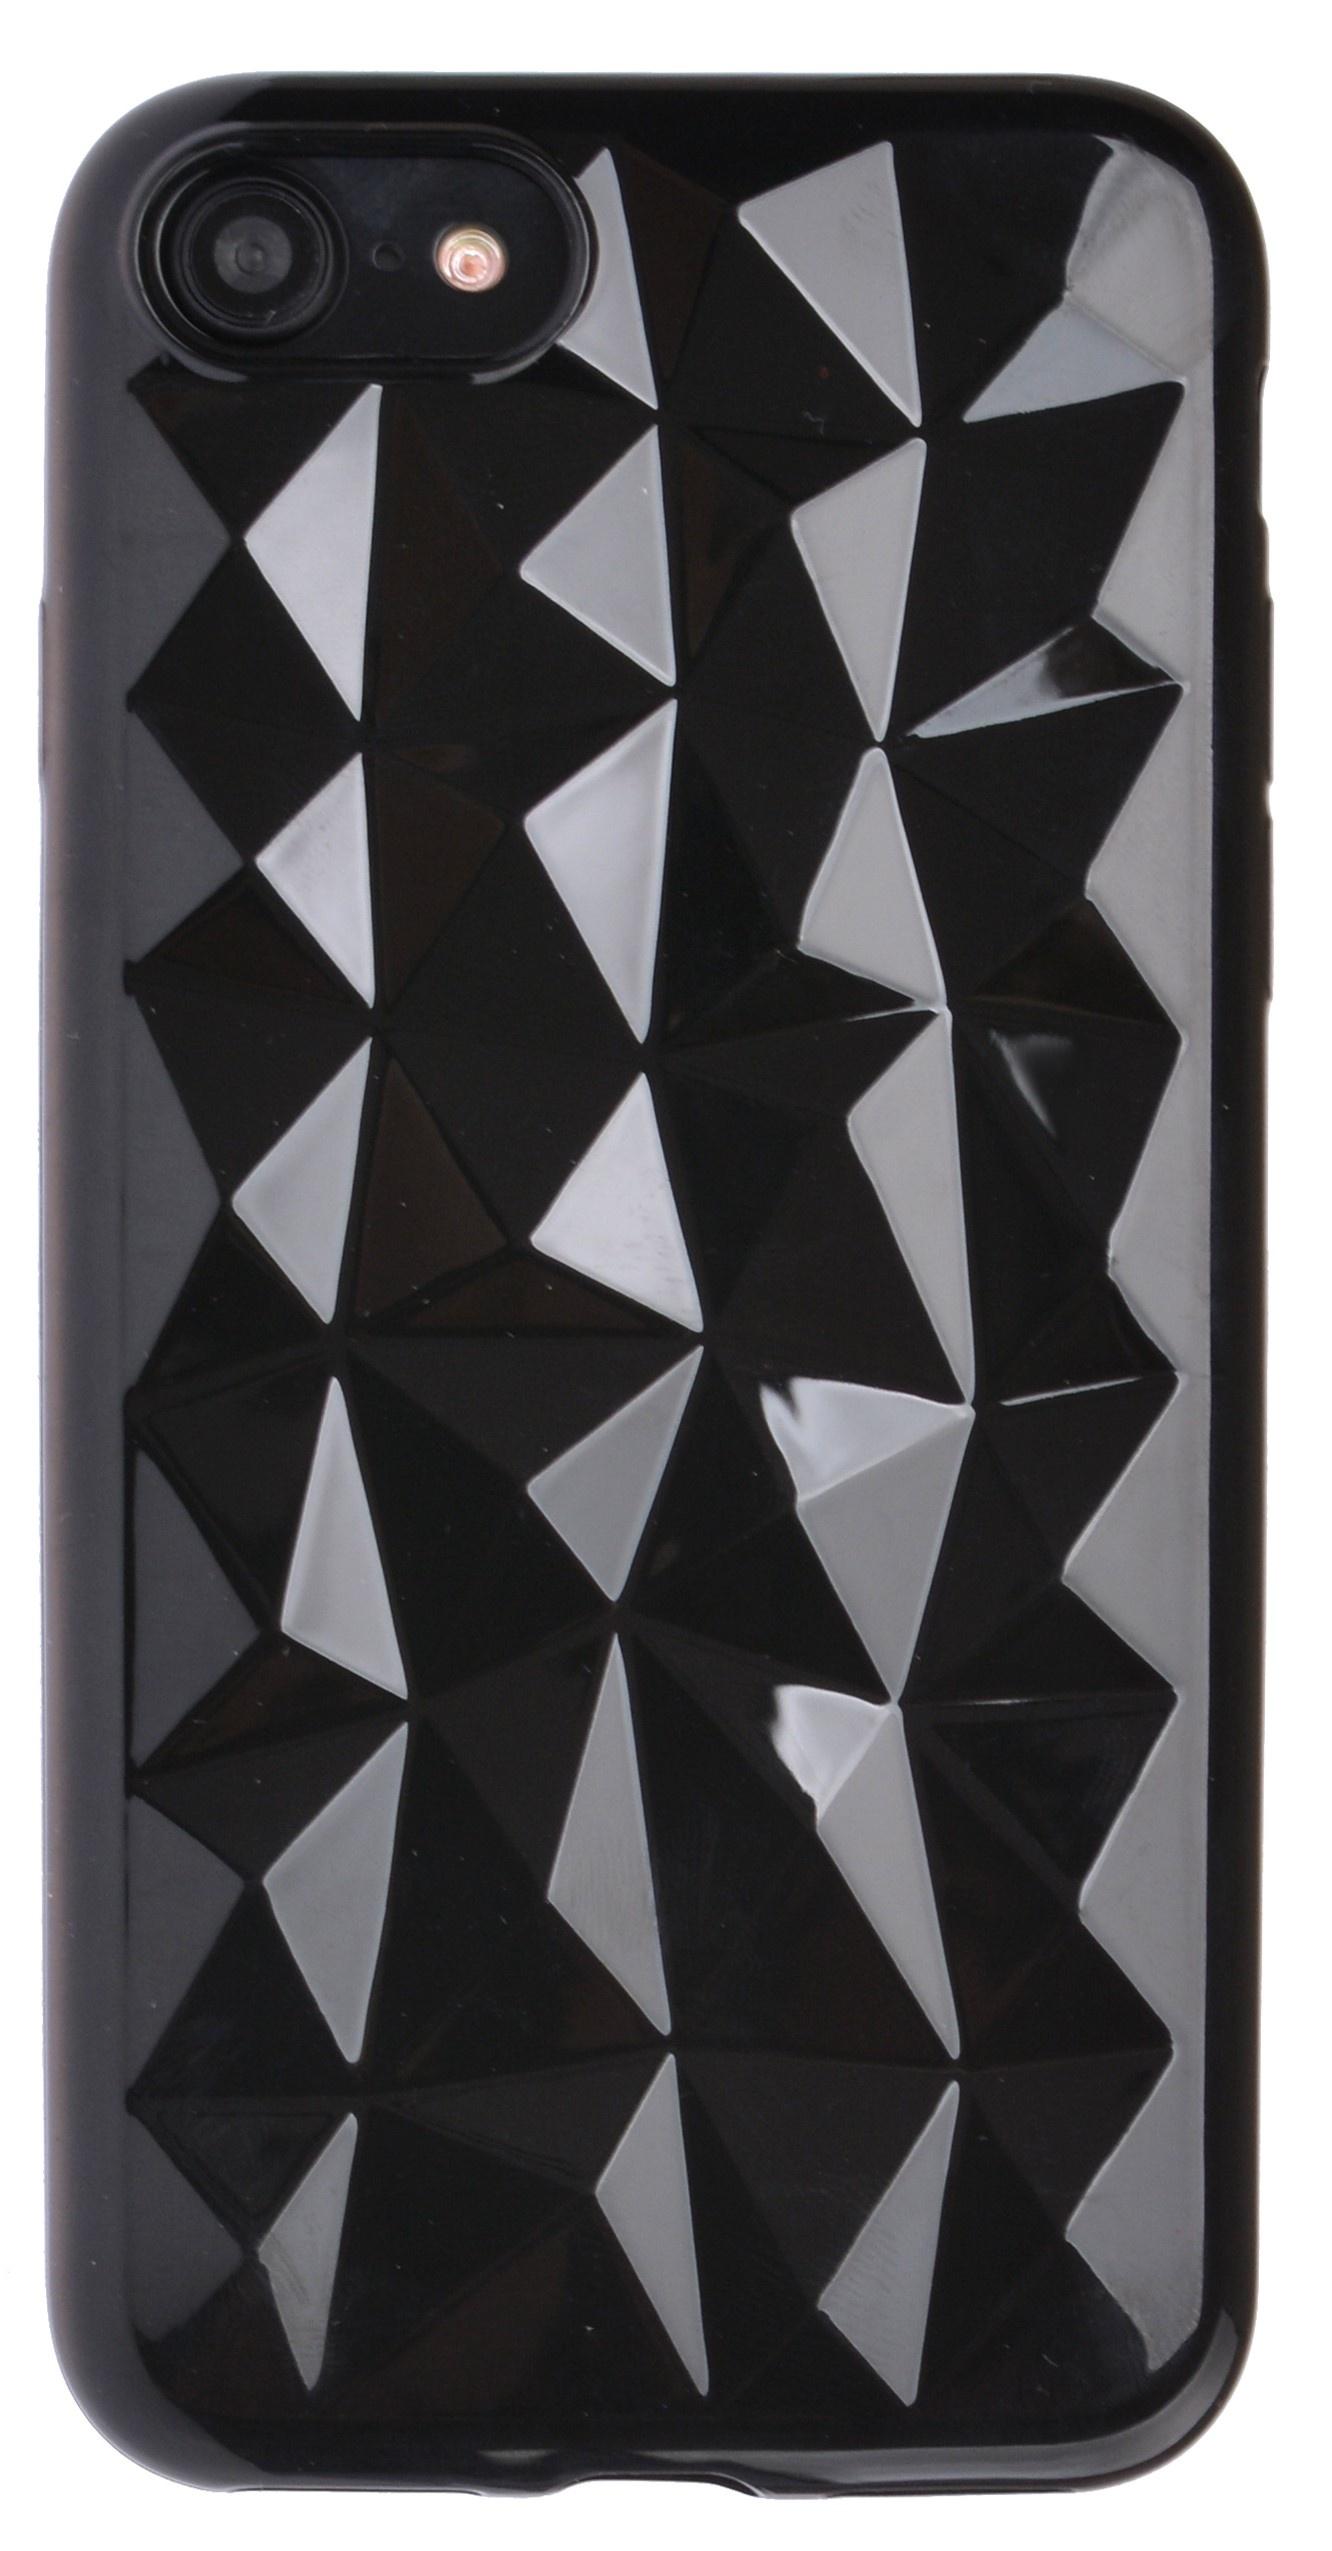 Чехол-накладка Skinbox Diamond для Apple iPhone 7/8, 4630042521025, черный чехол книжка для apple iphone 7 8 sgp valentinus черный